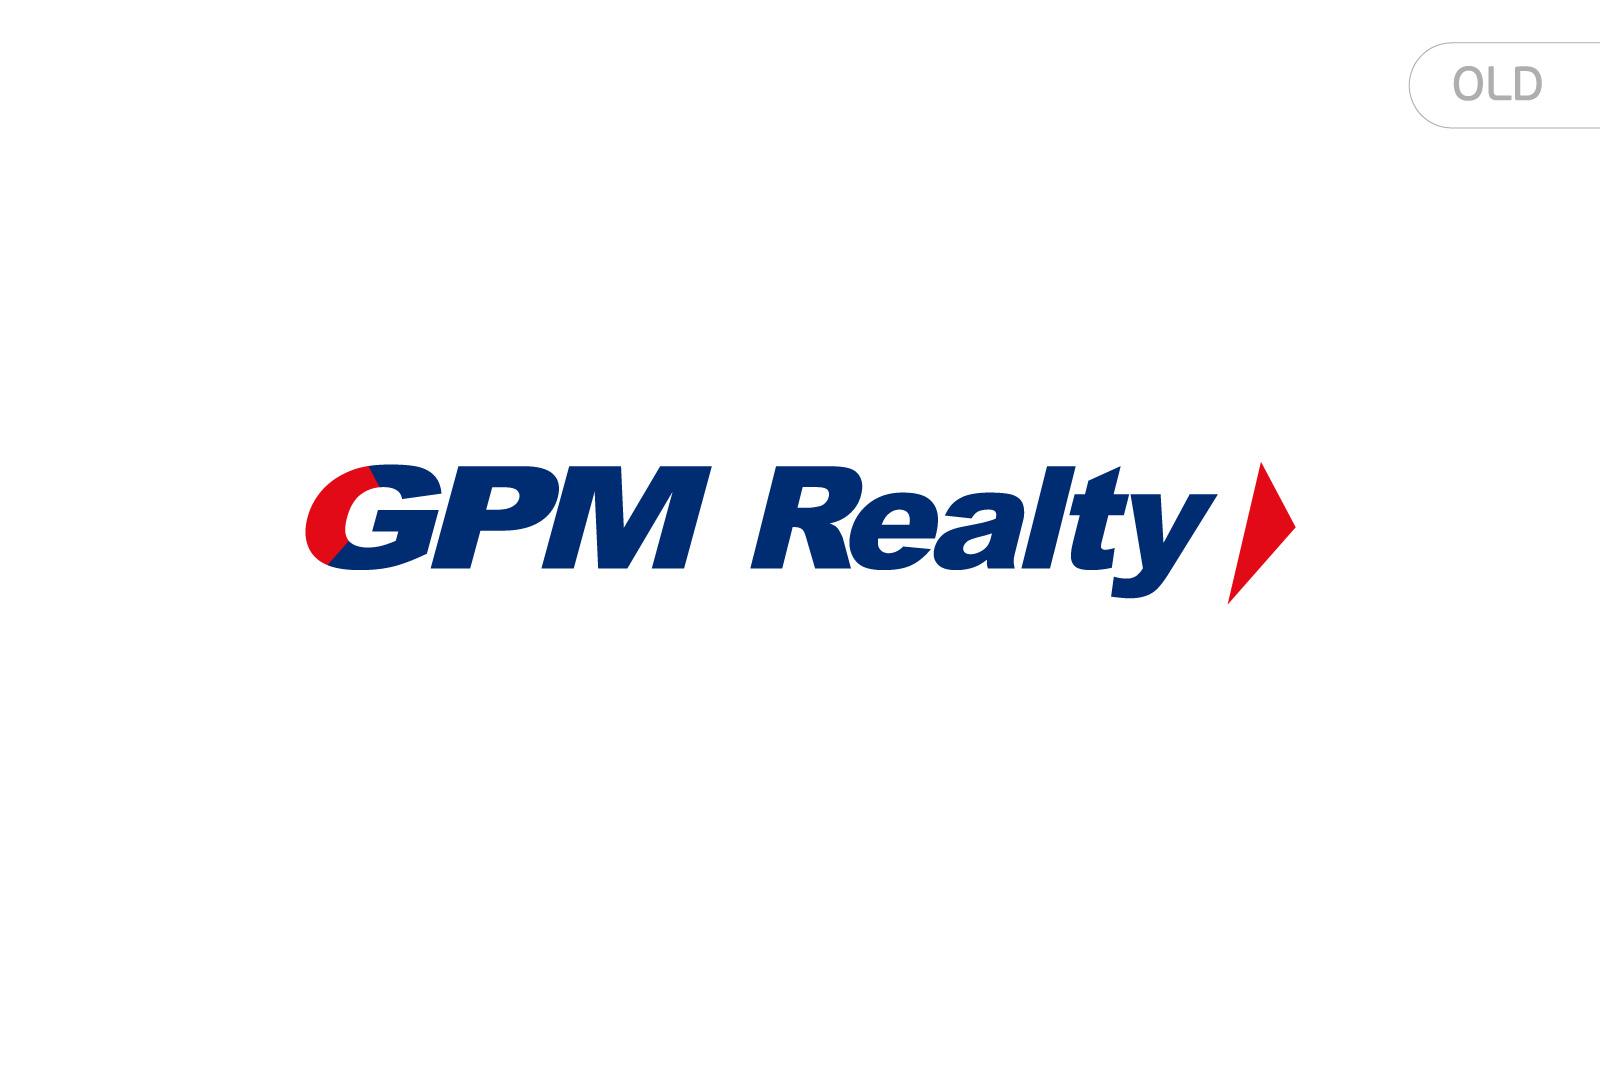 Asgard Branding, corporate identity, old logo design, GPM Realty, development branding, Uzbekistan